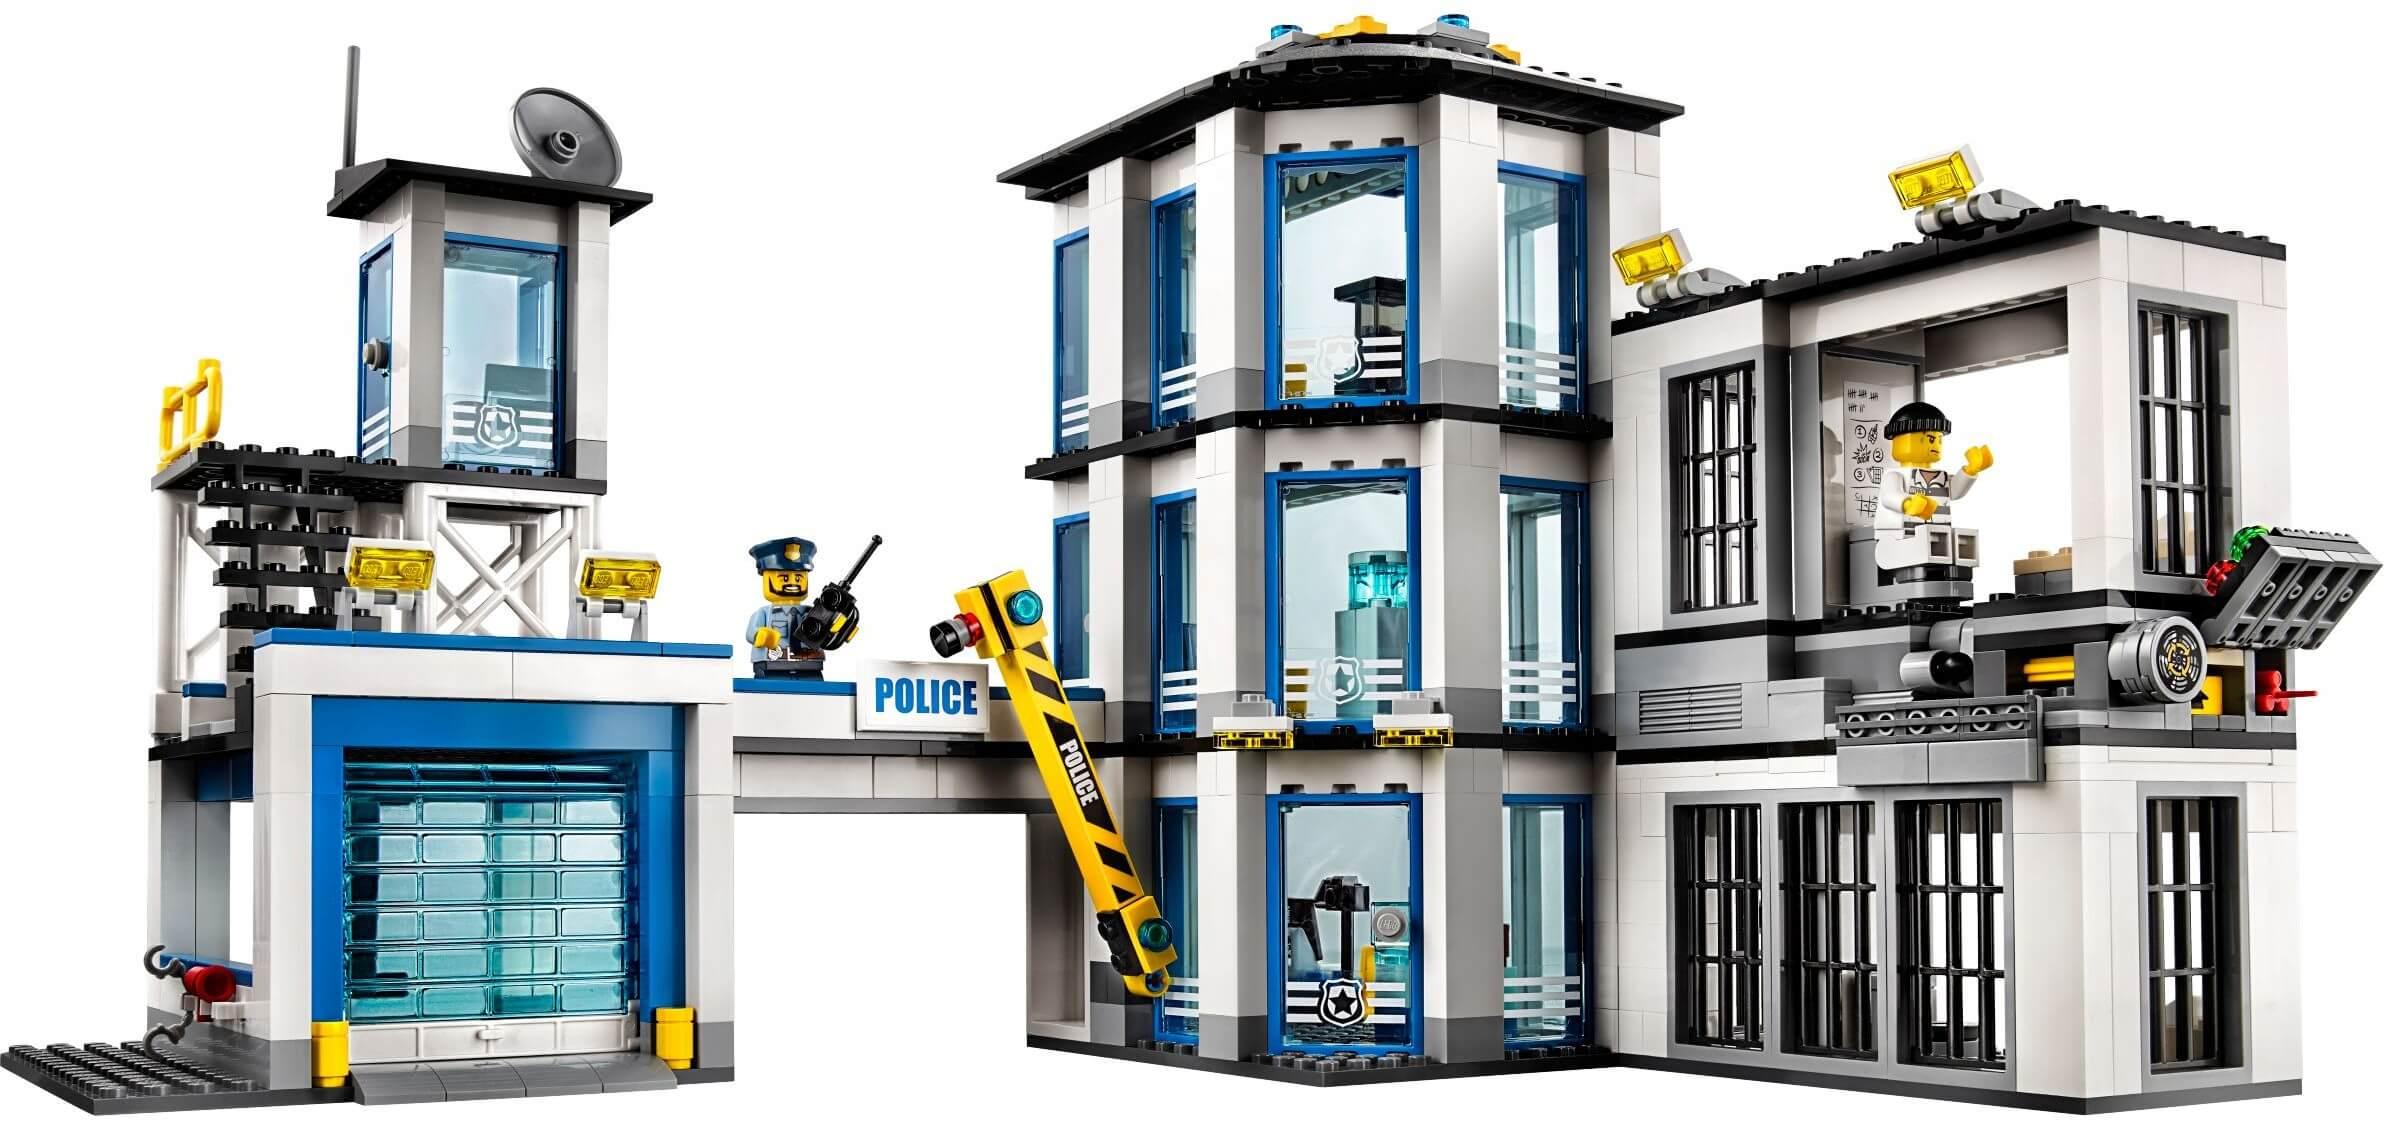 Mua đồ chơi LEGO 60141 - LEGO City 60141 - Trụ Sở Cảnh Sát (LEGO 60141 Police Station)